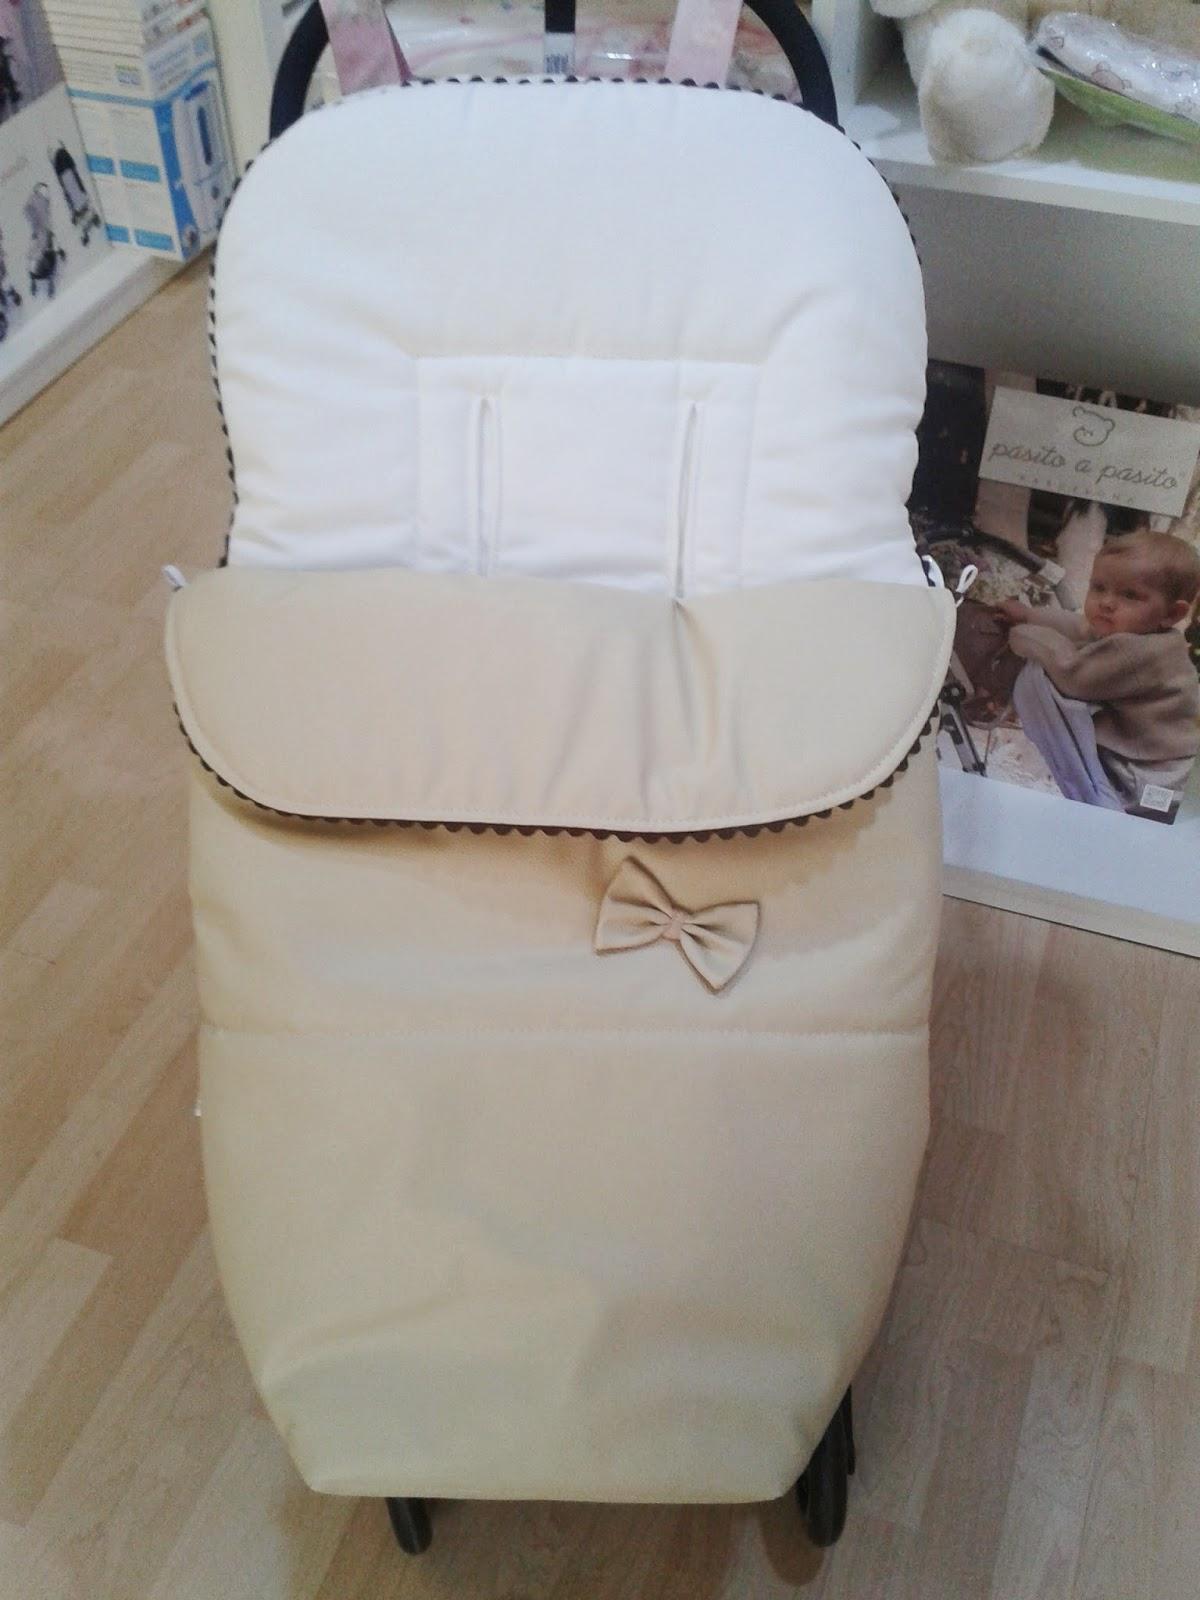 Lazos beb s sacos silla universal polipiel 49 90 - Sacos silla baratos ...